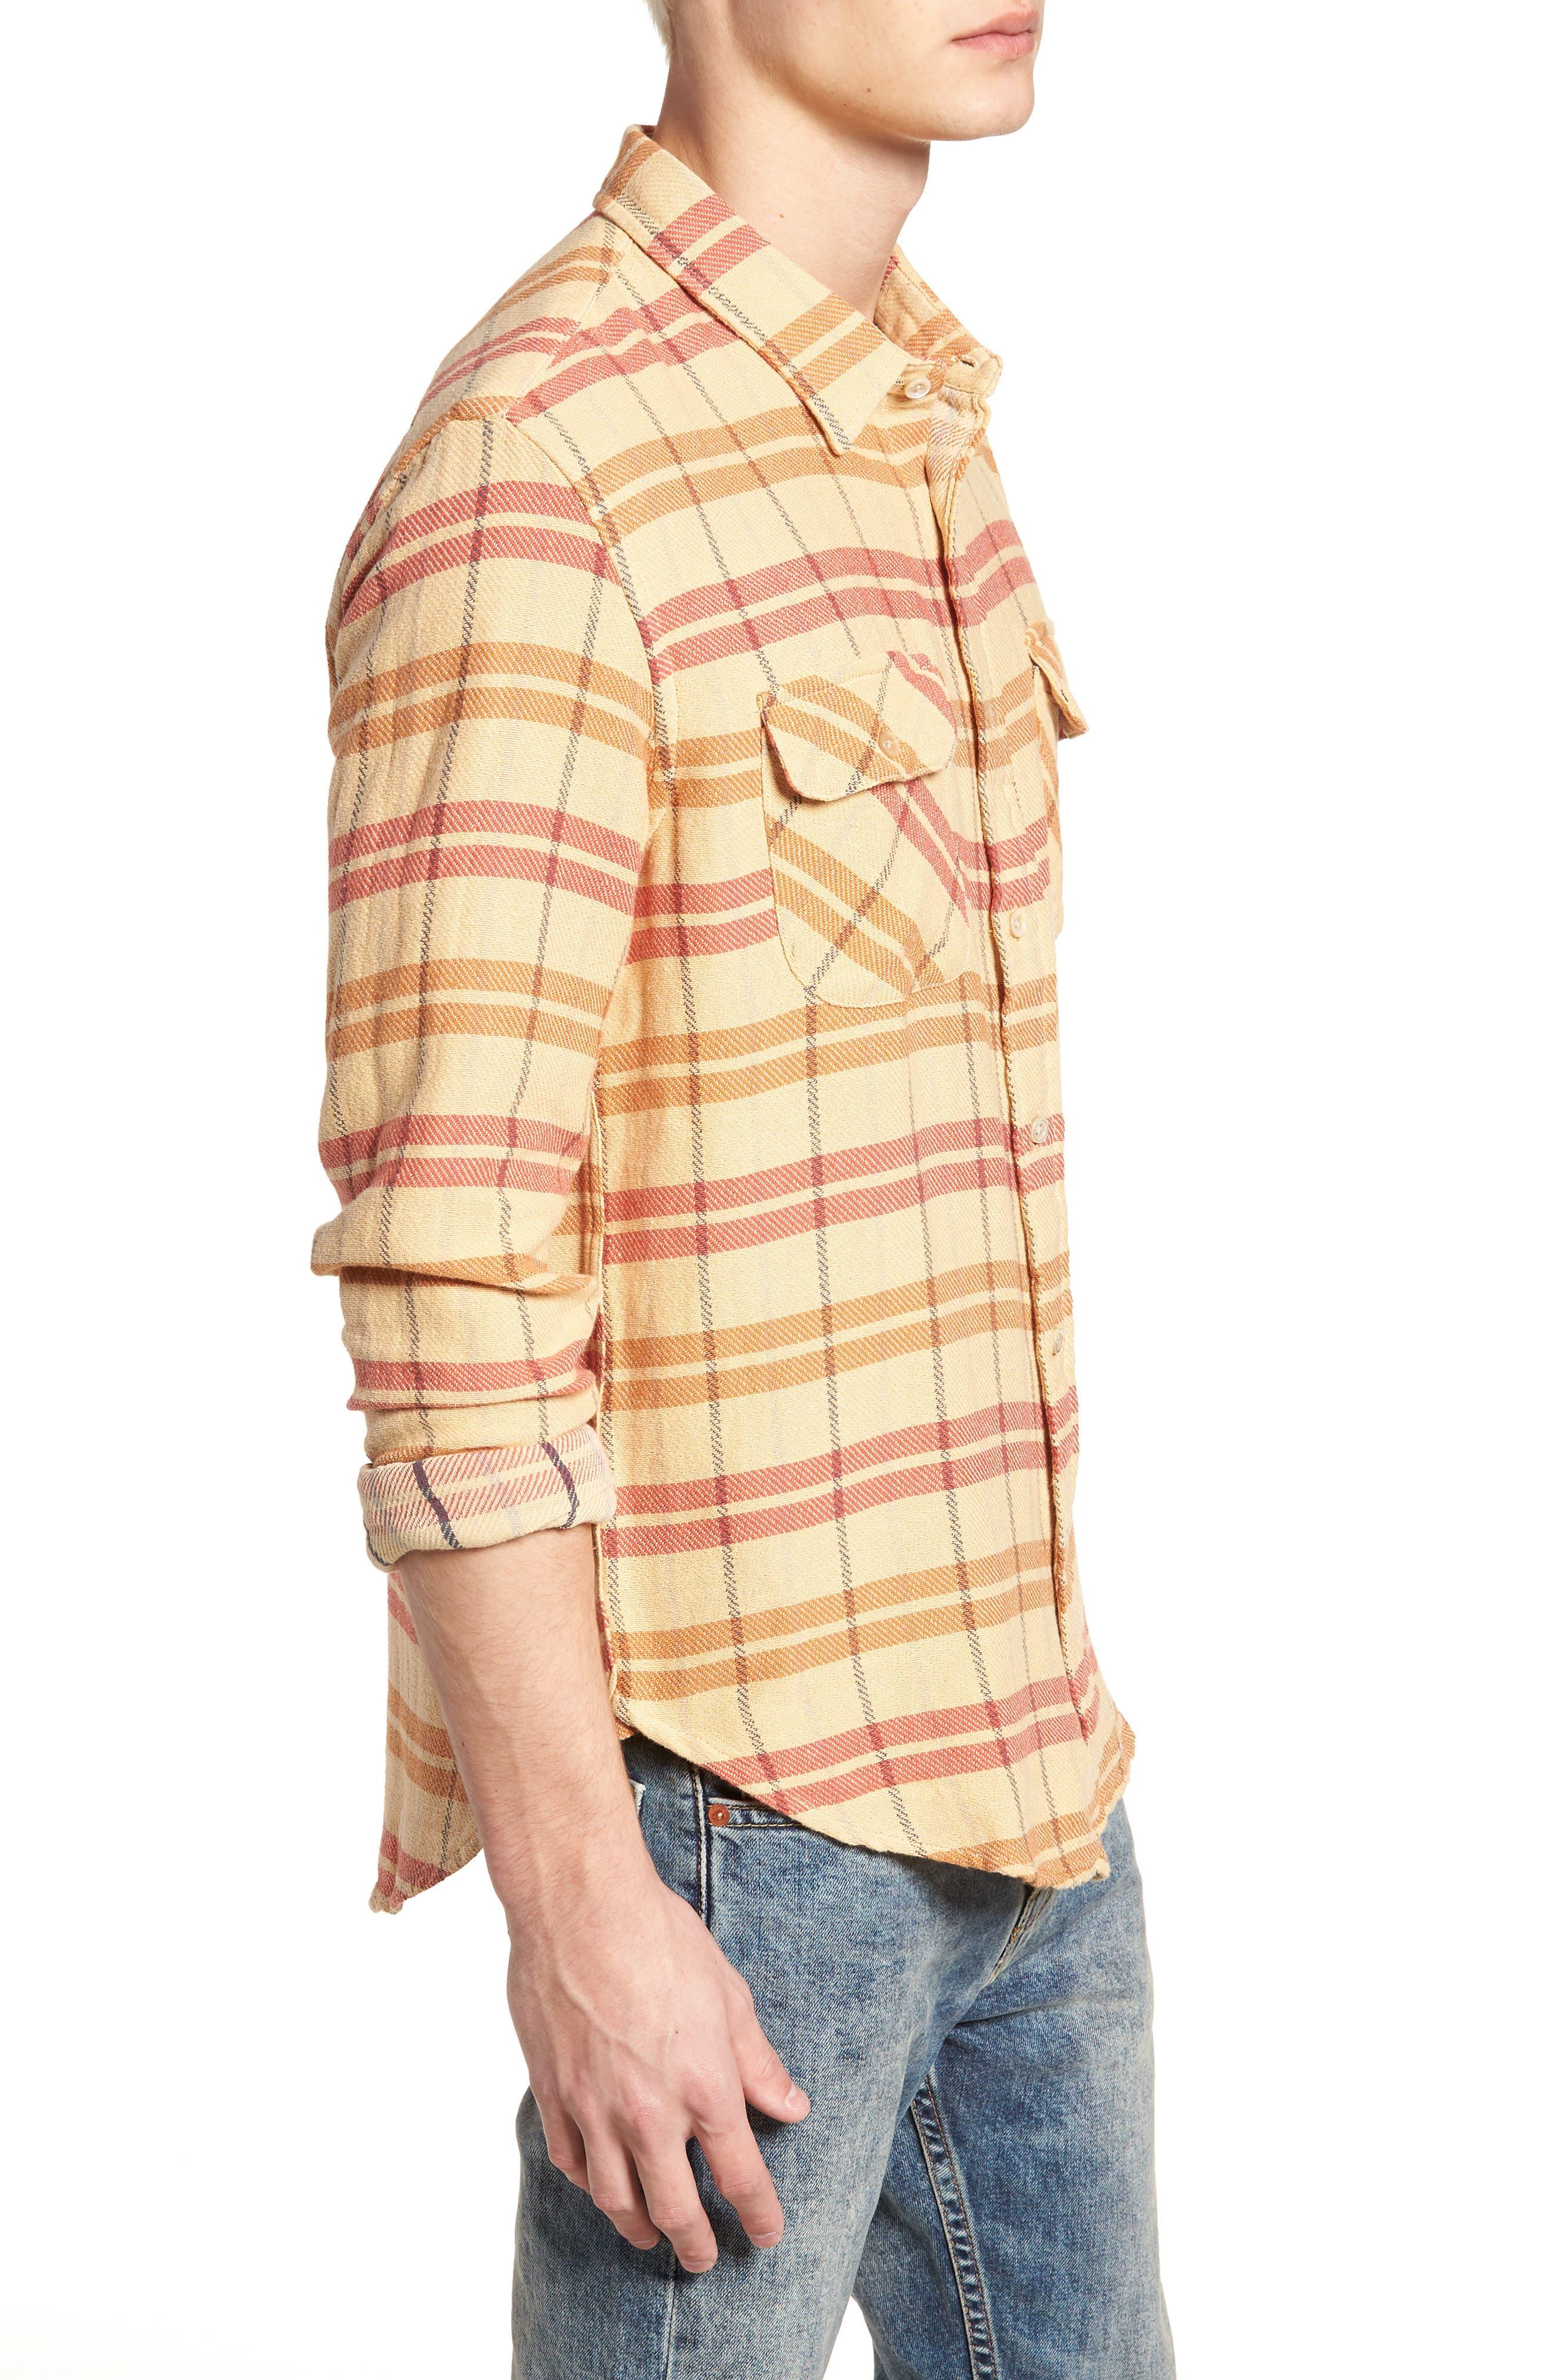 Shorthorn Western Shirt,                             Alternate thumbnail 4, color,                             Sunfaded Orange